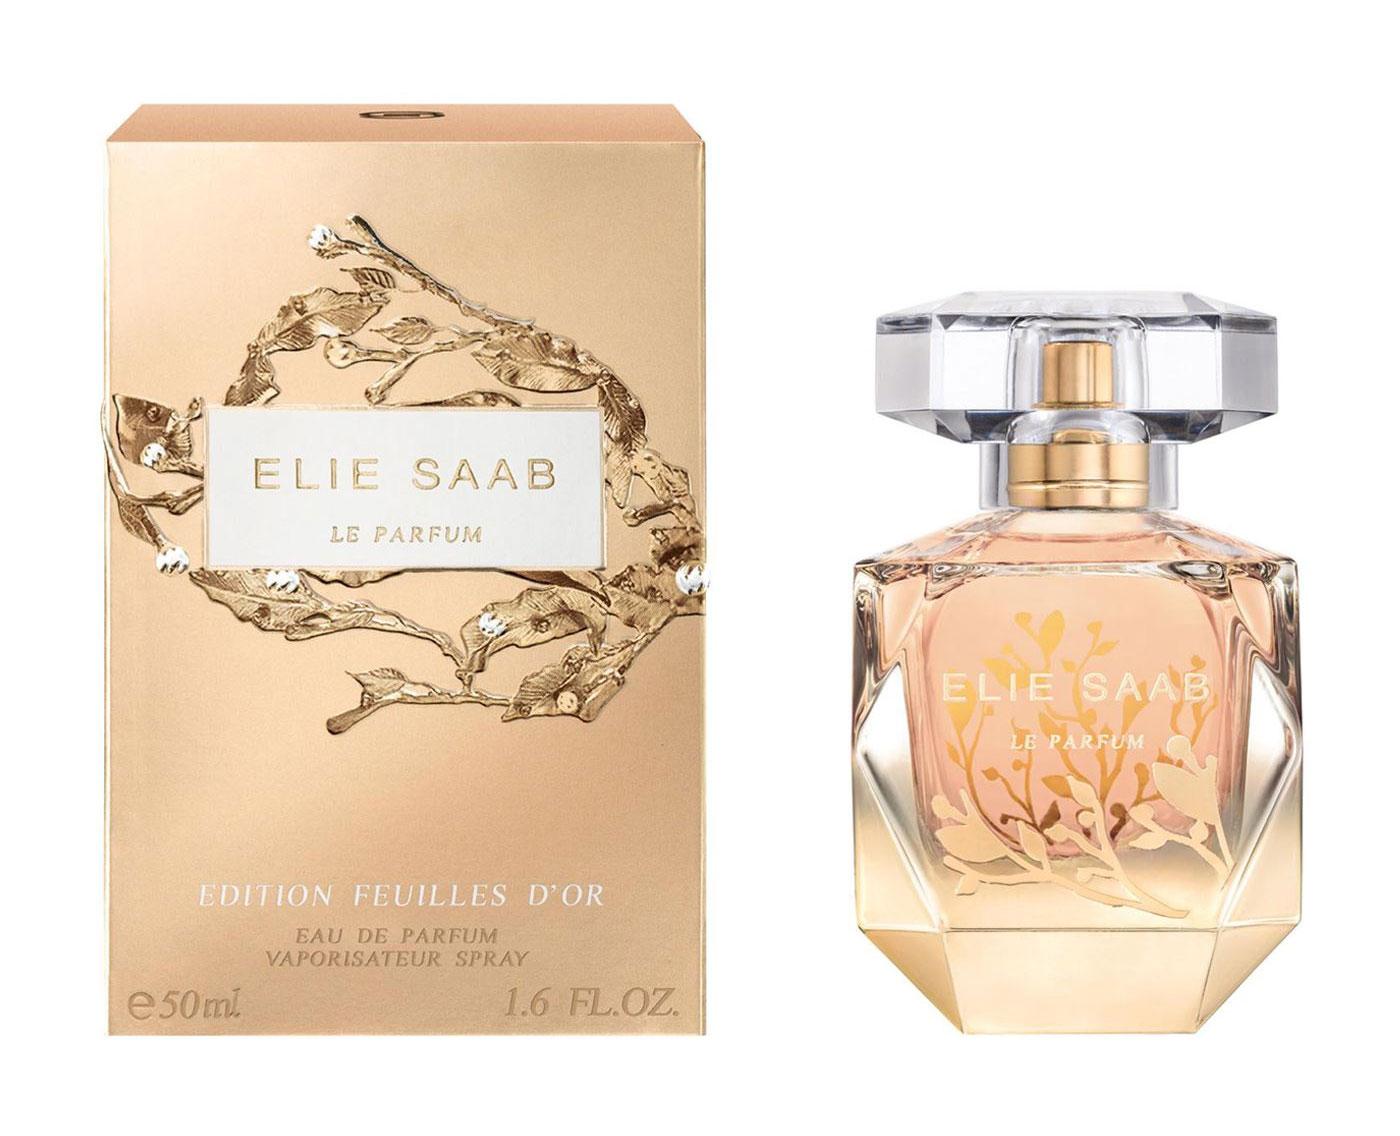 a409eed91 العطر الجديد من ايلي صعب Le Parfum Edition Feuilles d'Or ~ إصدار جديد